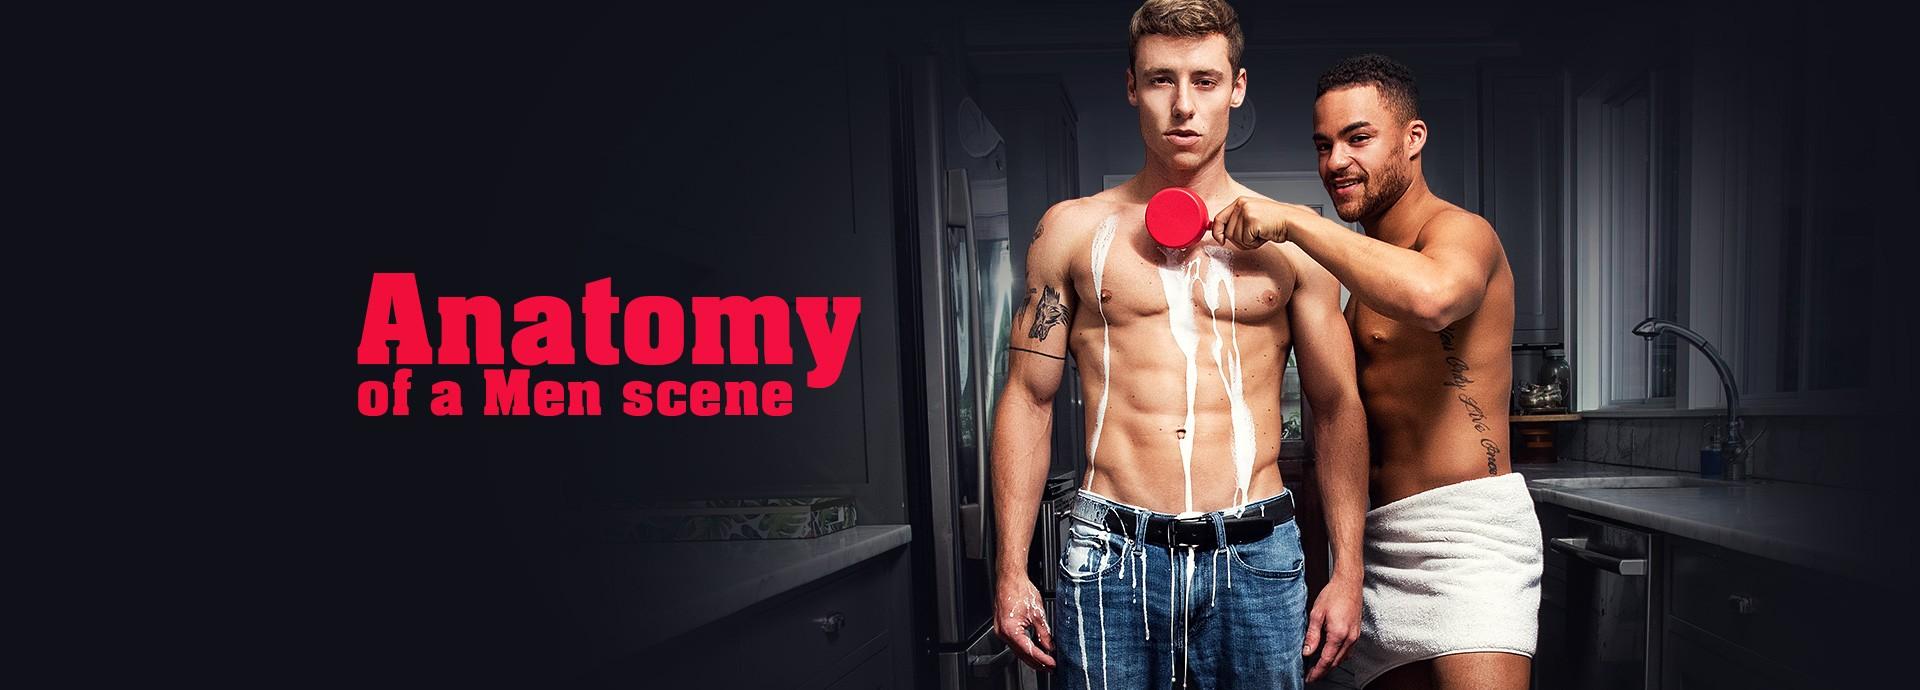 Men Anatomy Of A Men Scene